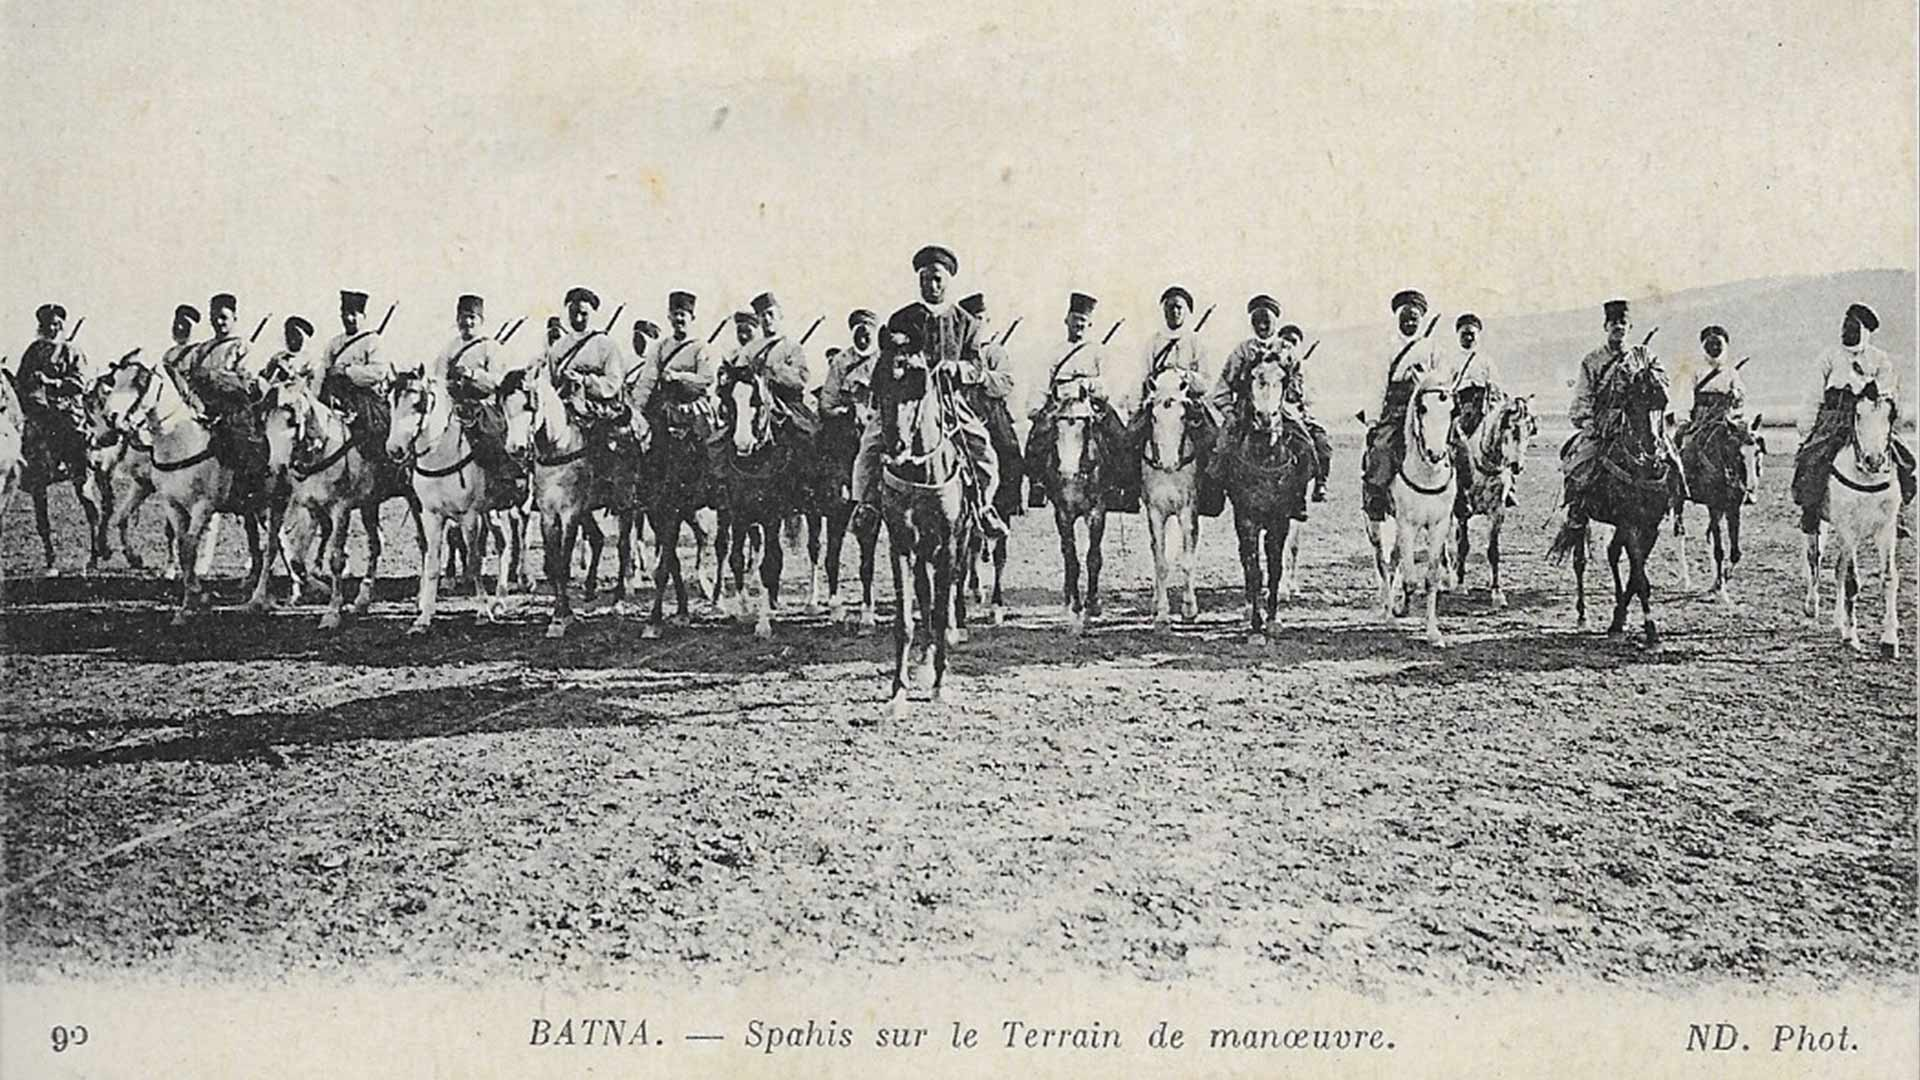 Batna-Spahis